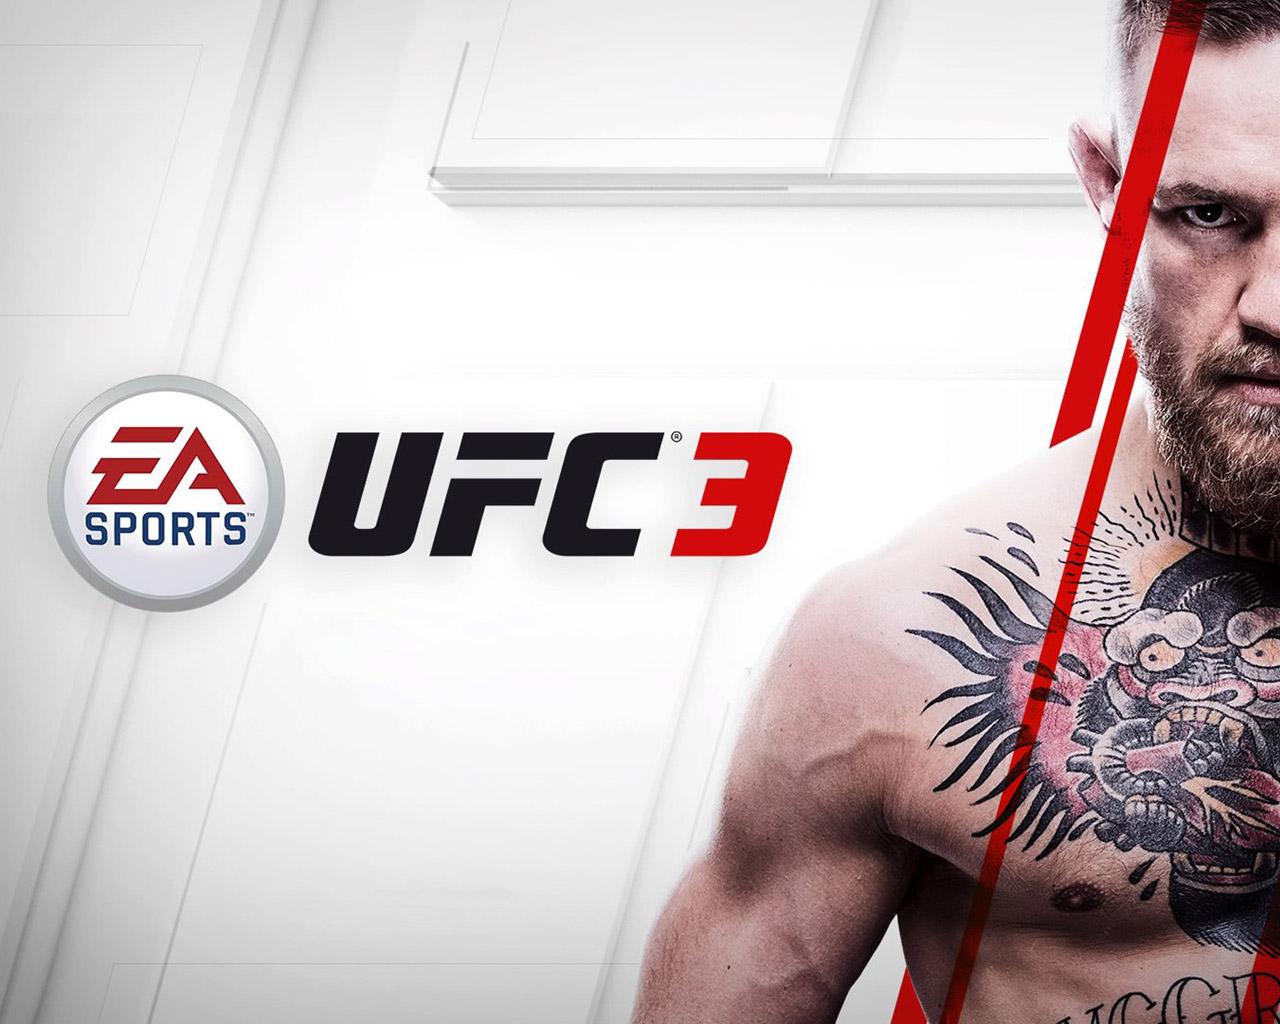 Free EA Sports UFC 3 Wallpaper in 1280x1024